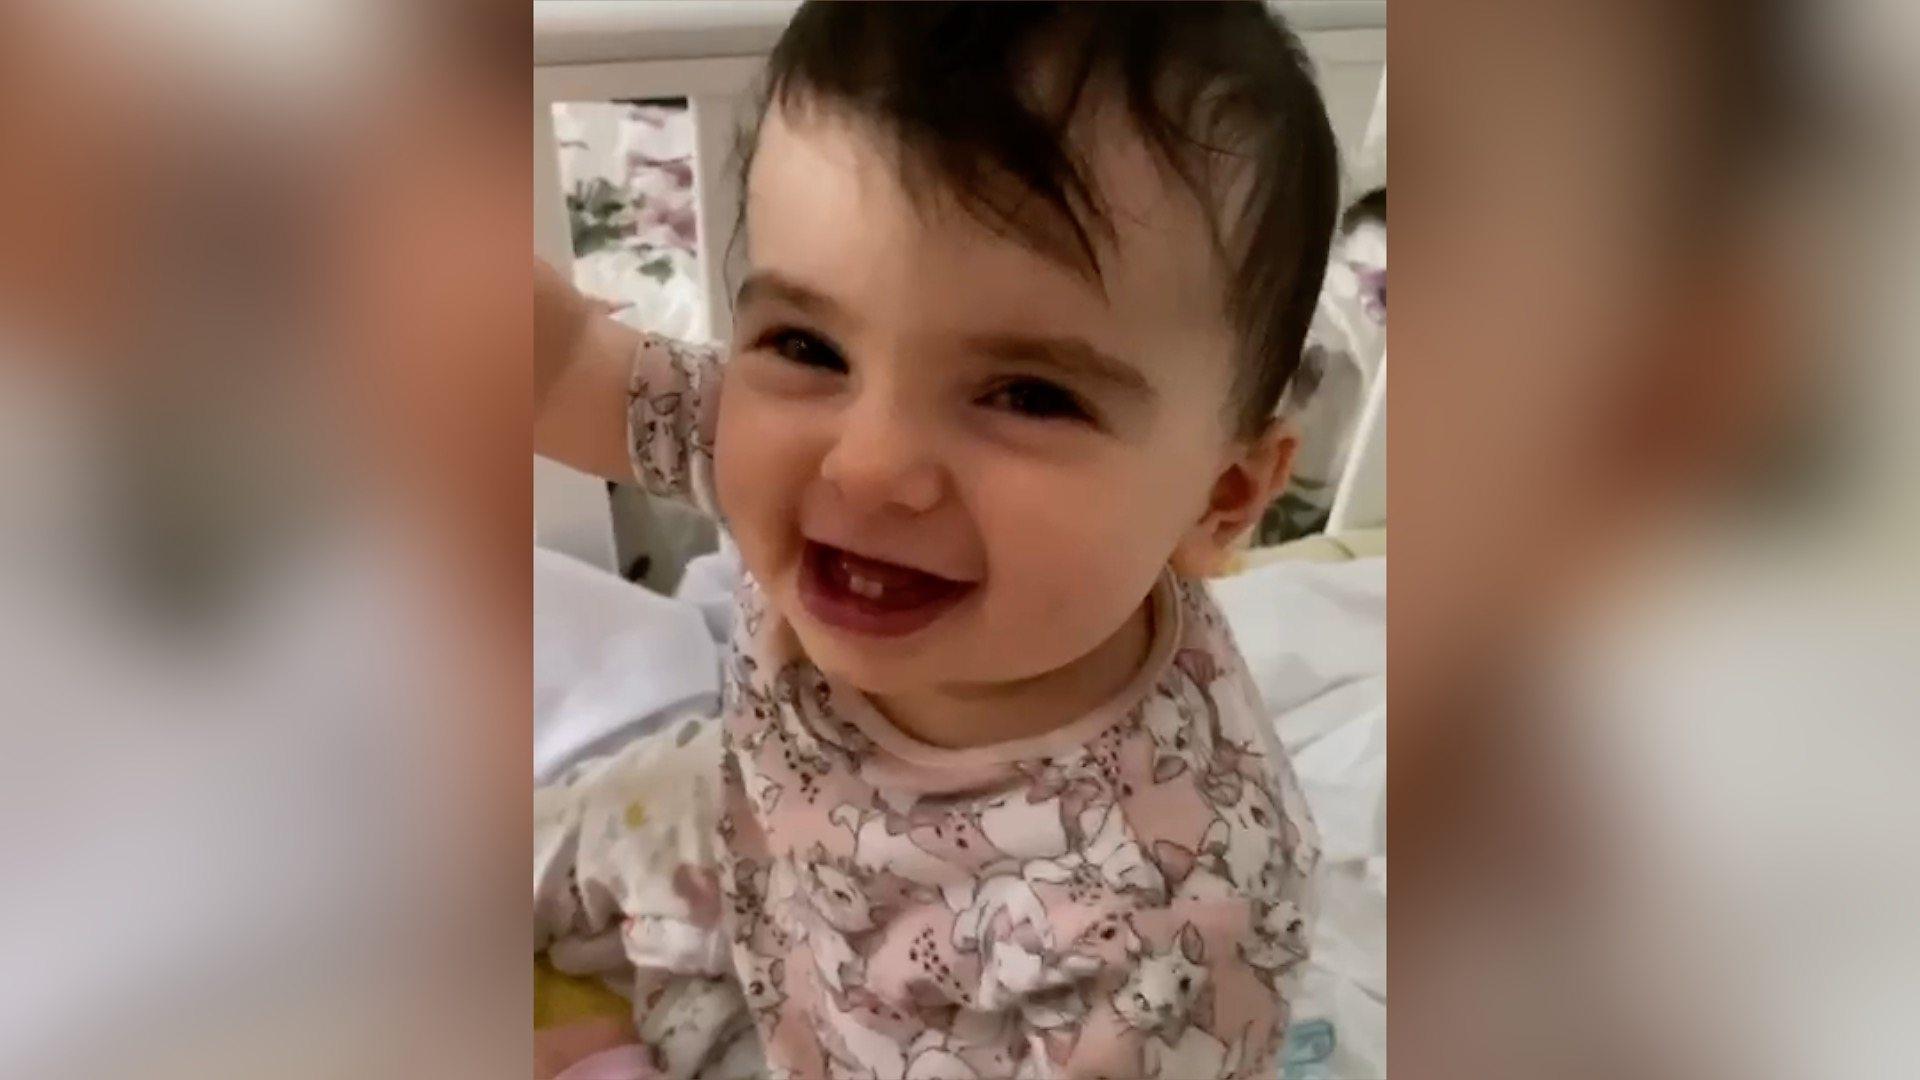 Brittle bone disease toddler inspiring mum and dad - BBC News